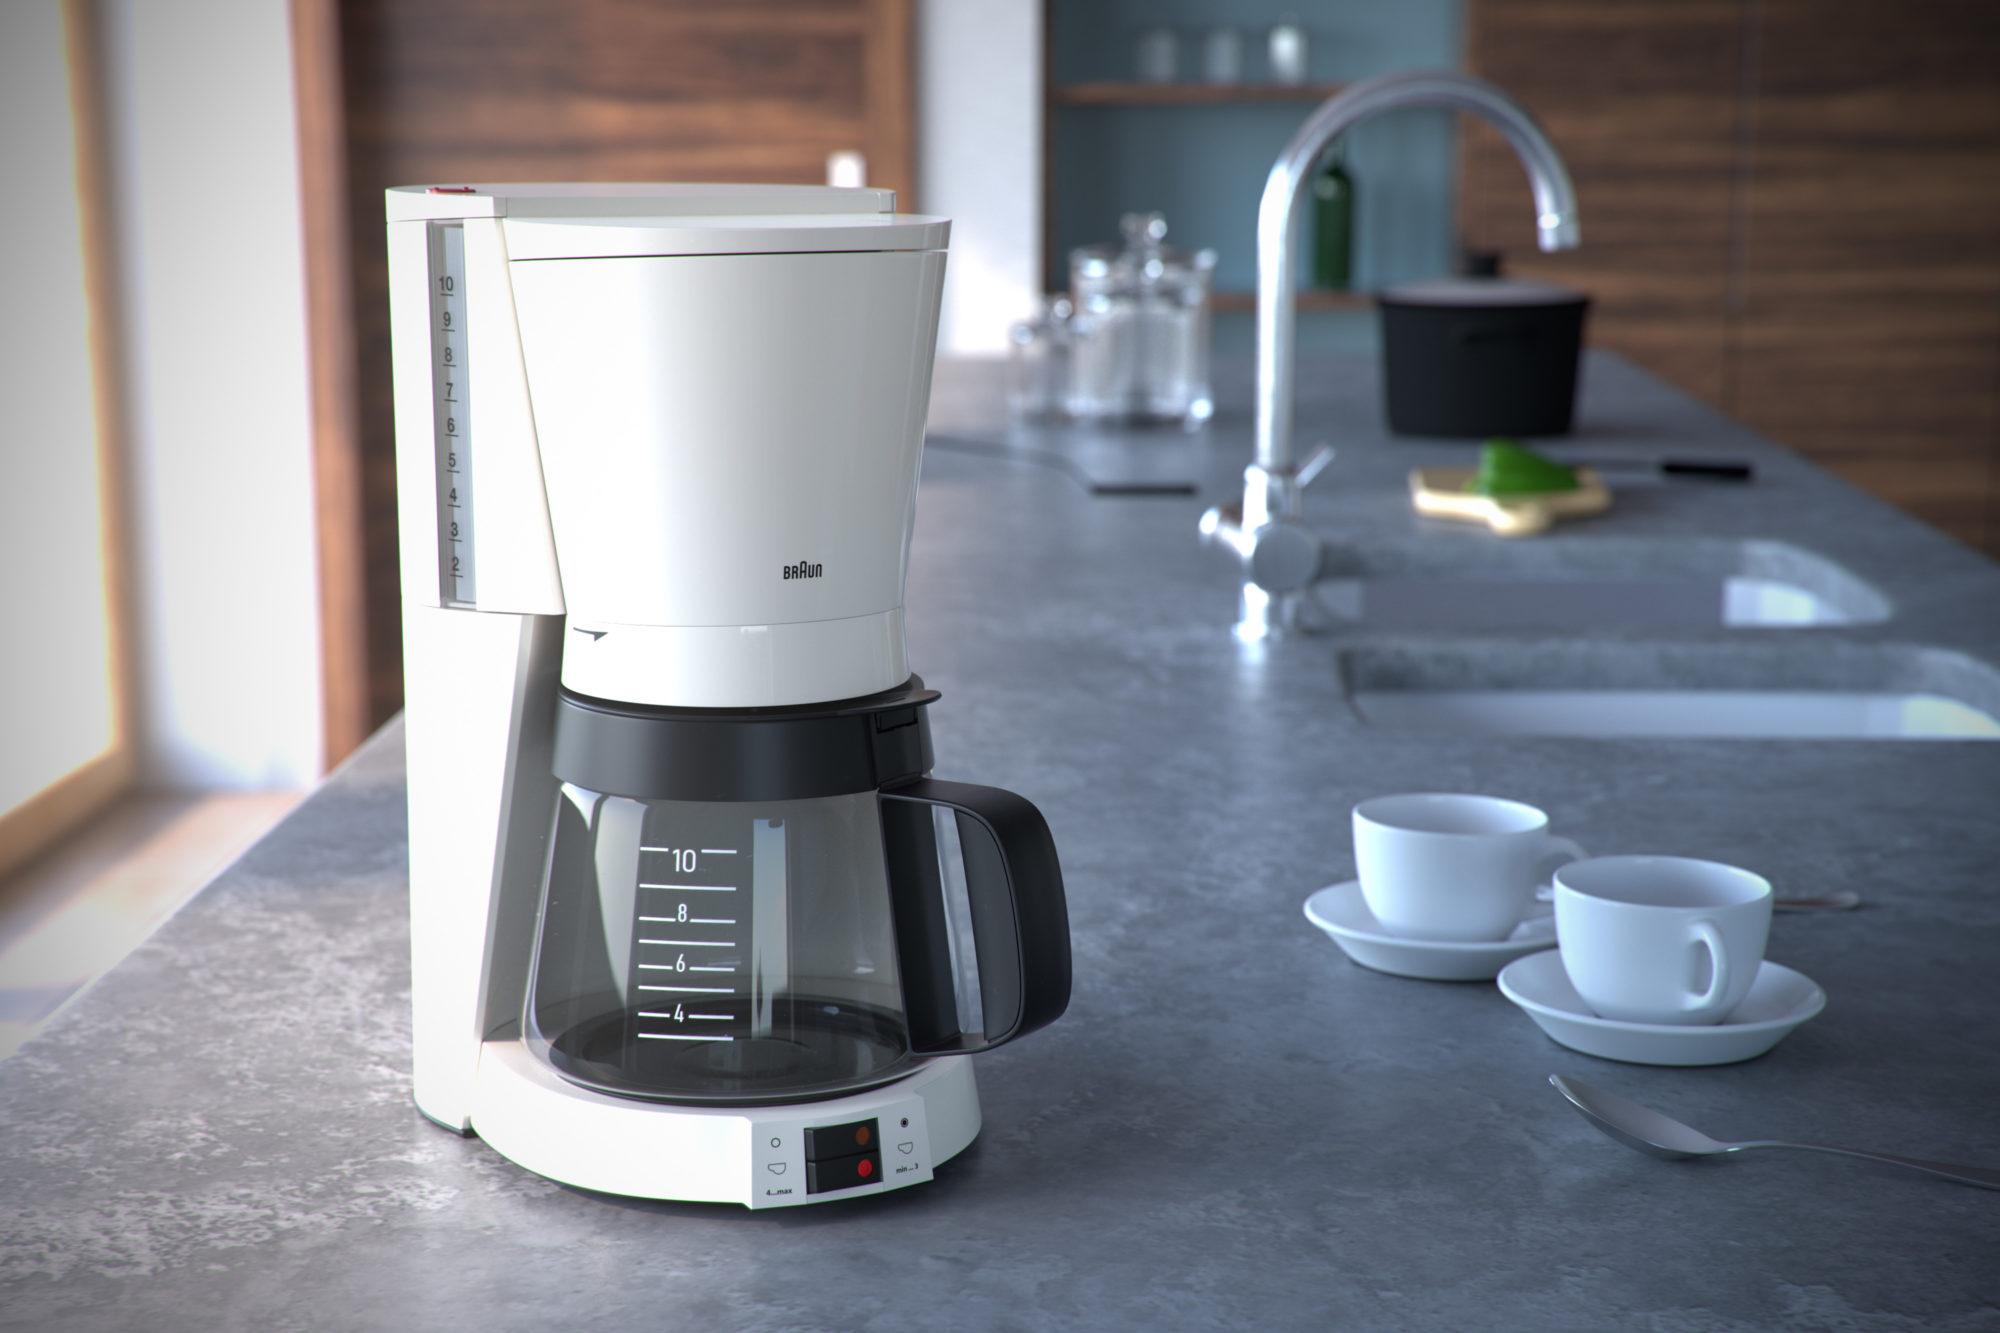 Stefan Eder 3D Produkt Rendering Kaffeemaschine Braun Küche